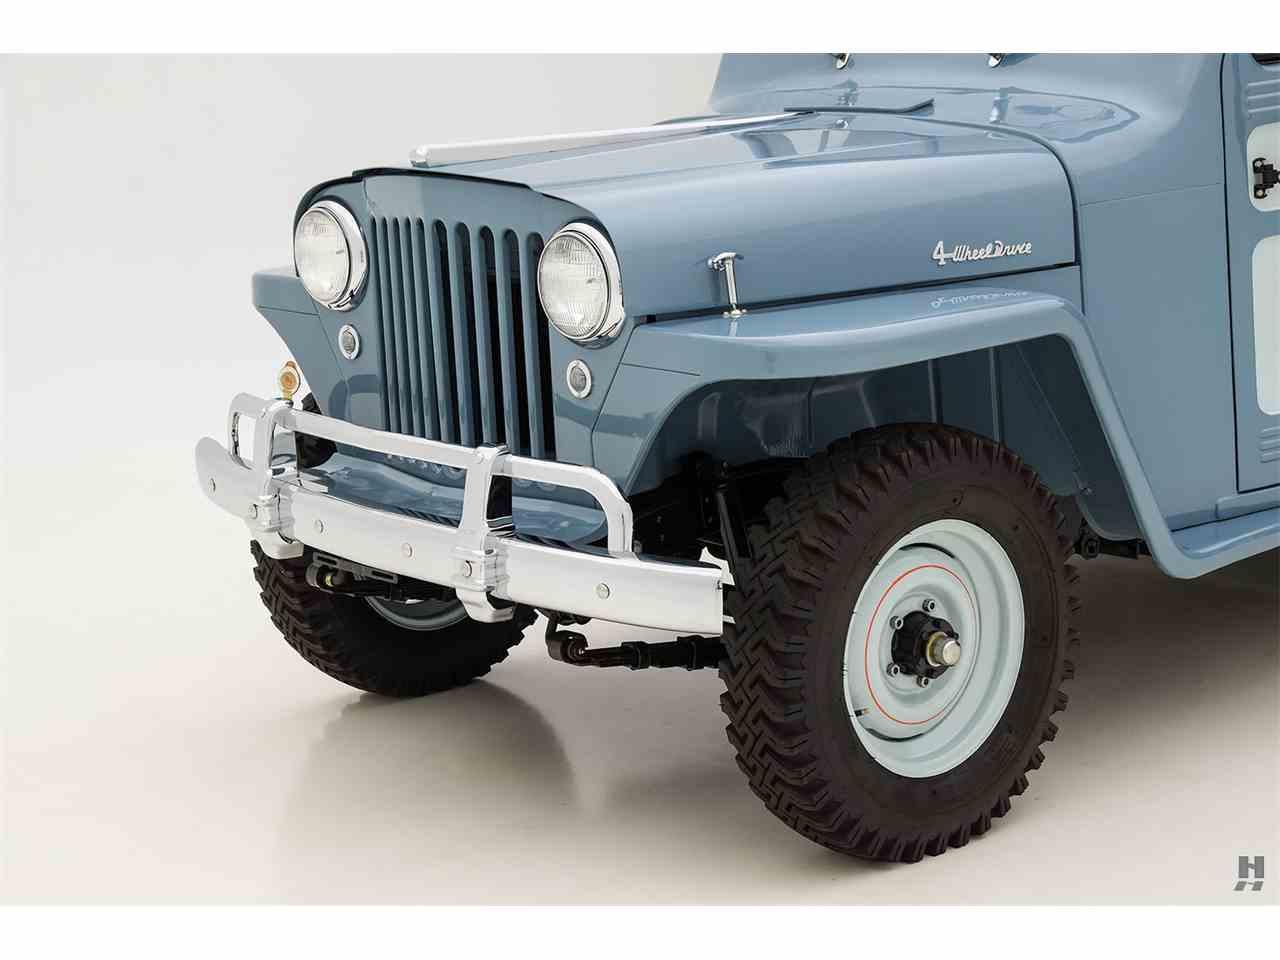 1948 willys overland jeep for sale cc. Black Bedroom Furniture Sets. Home Design Ideas